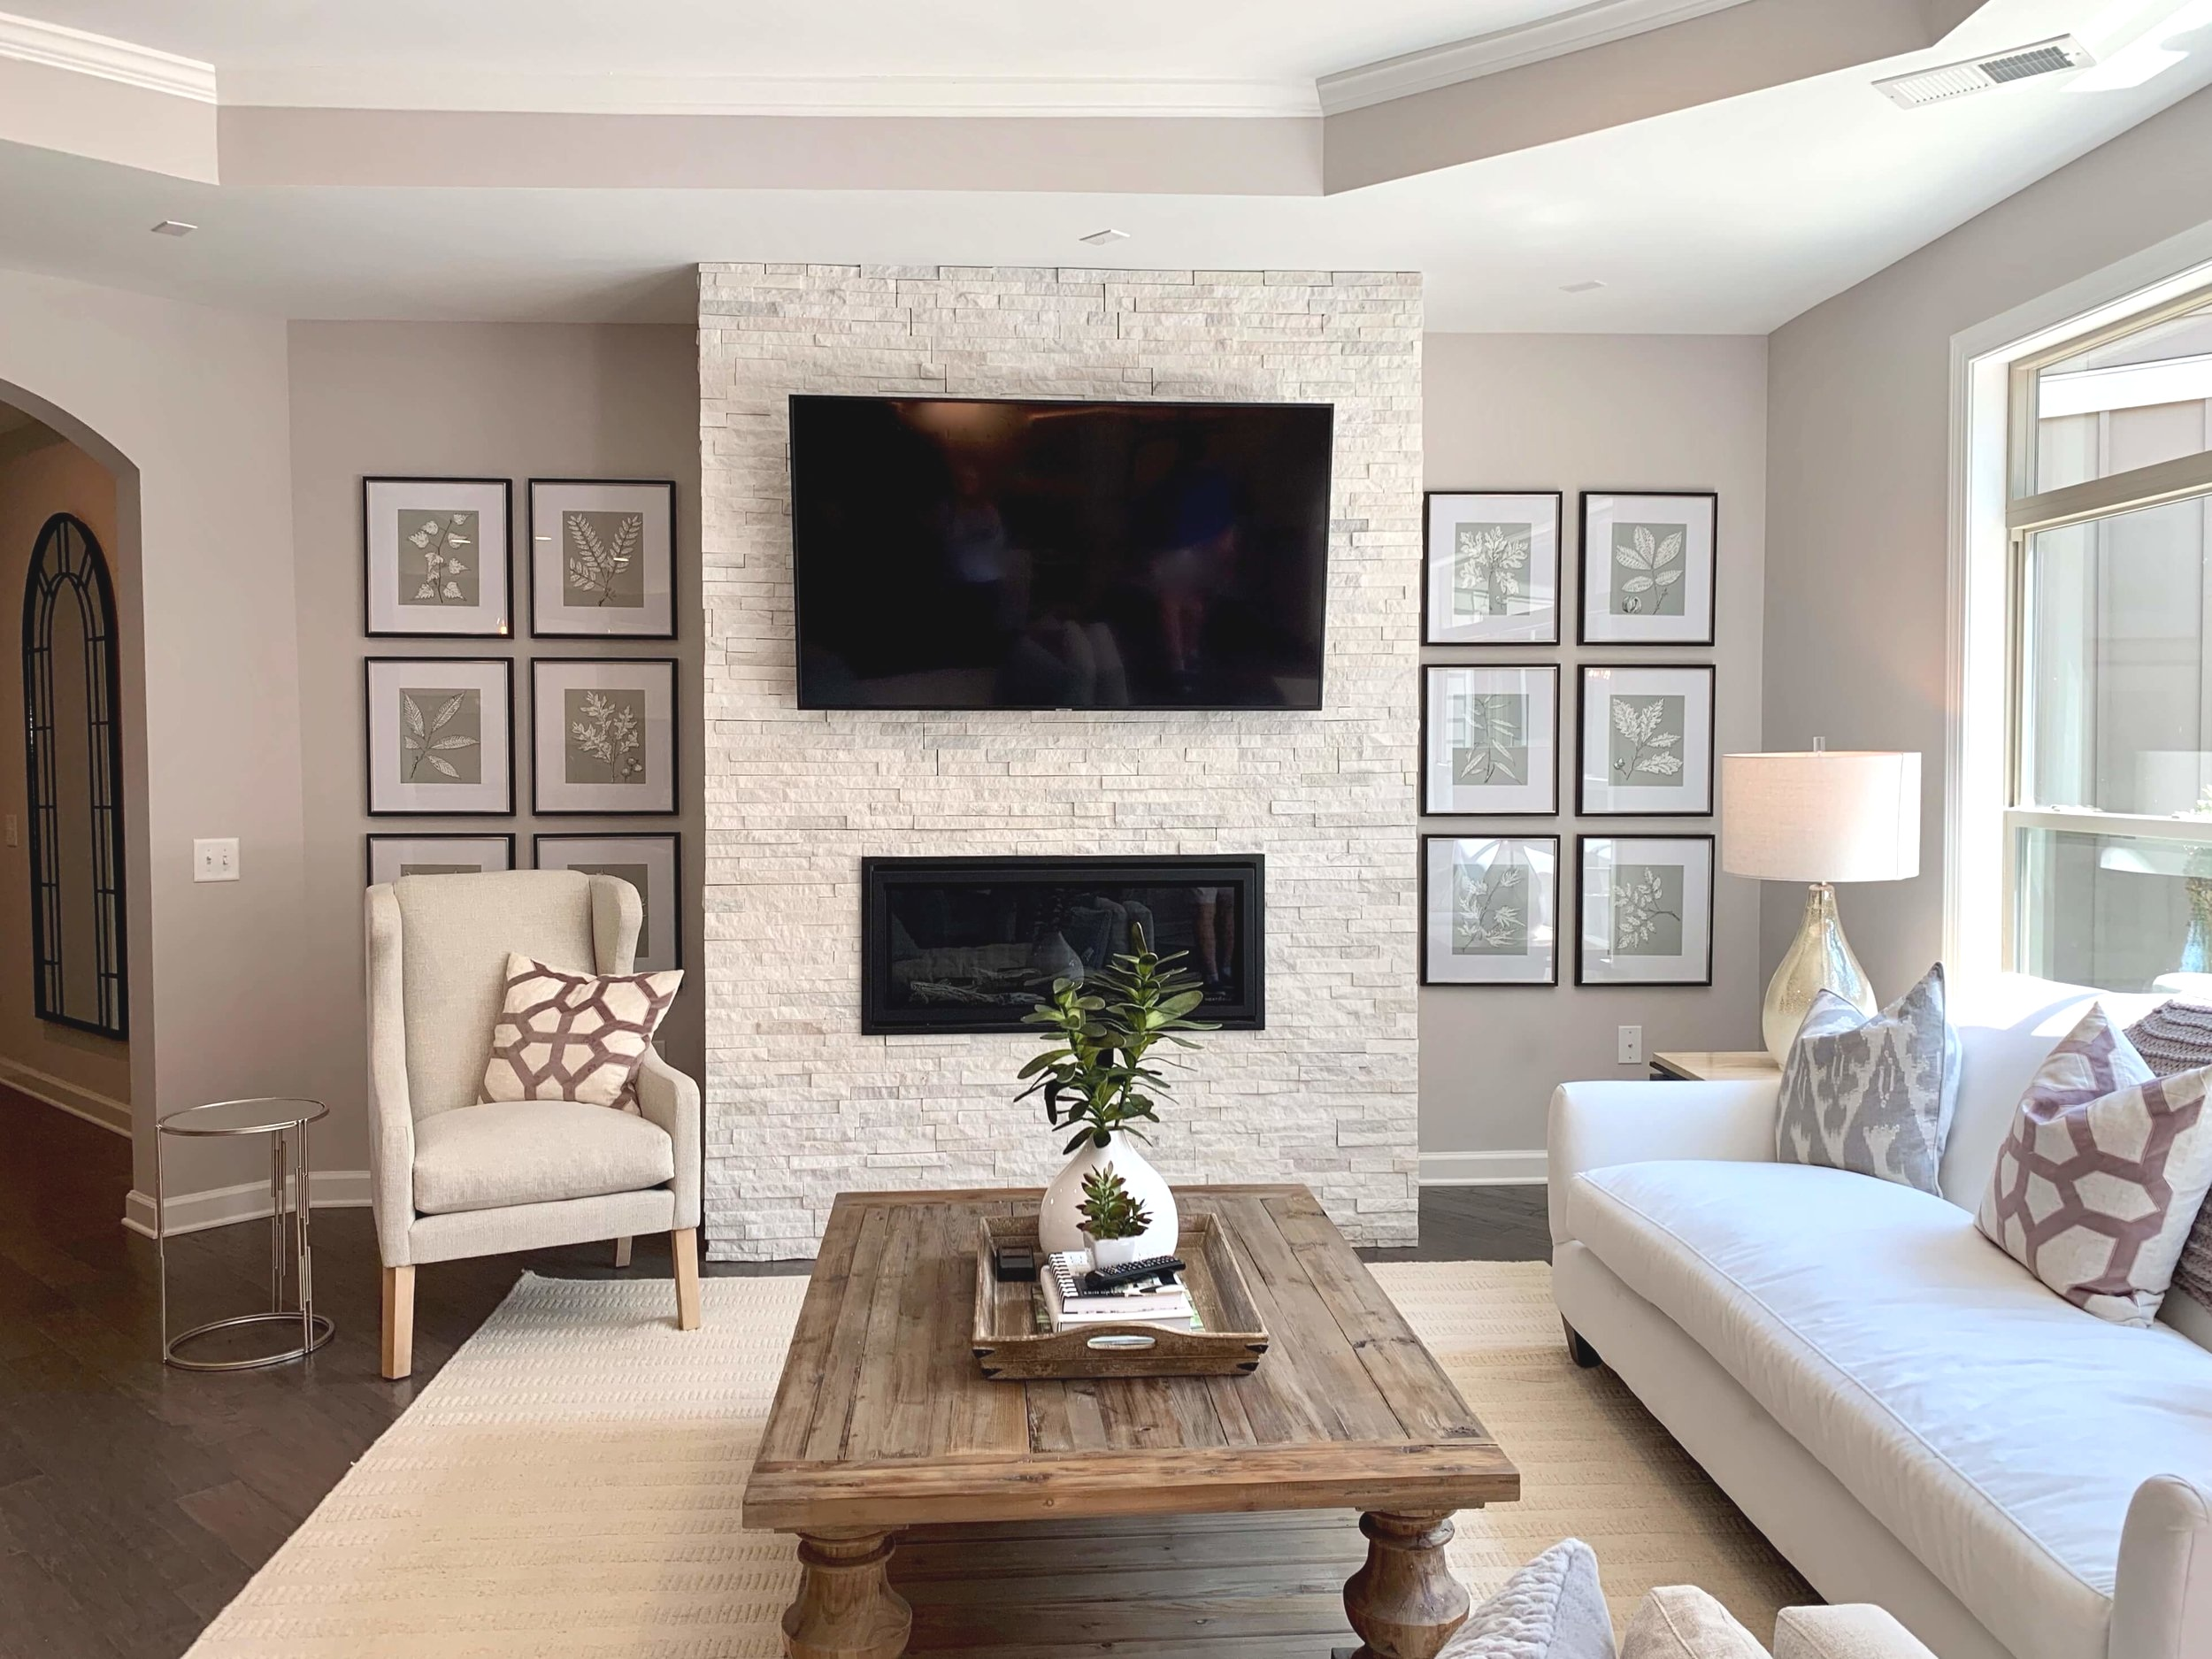 family-room-open-floorplan-decorating-ideas.jpg